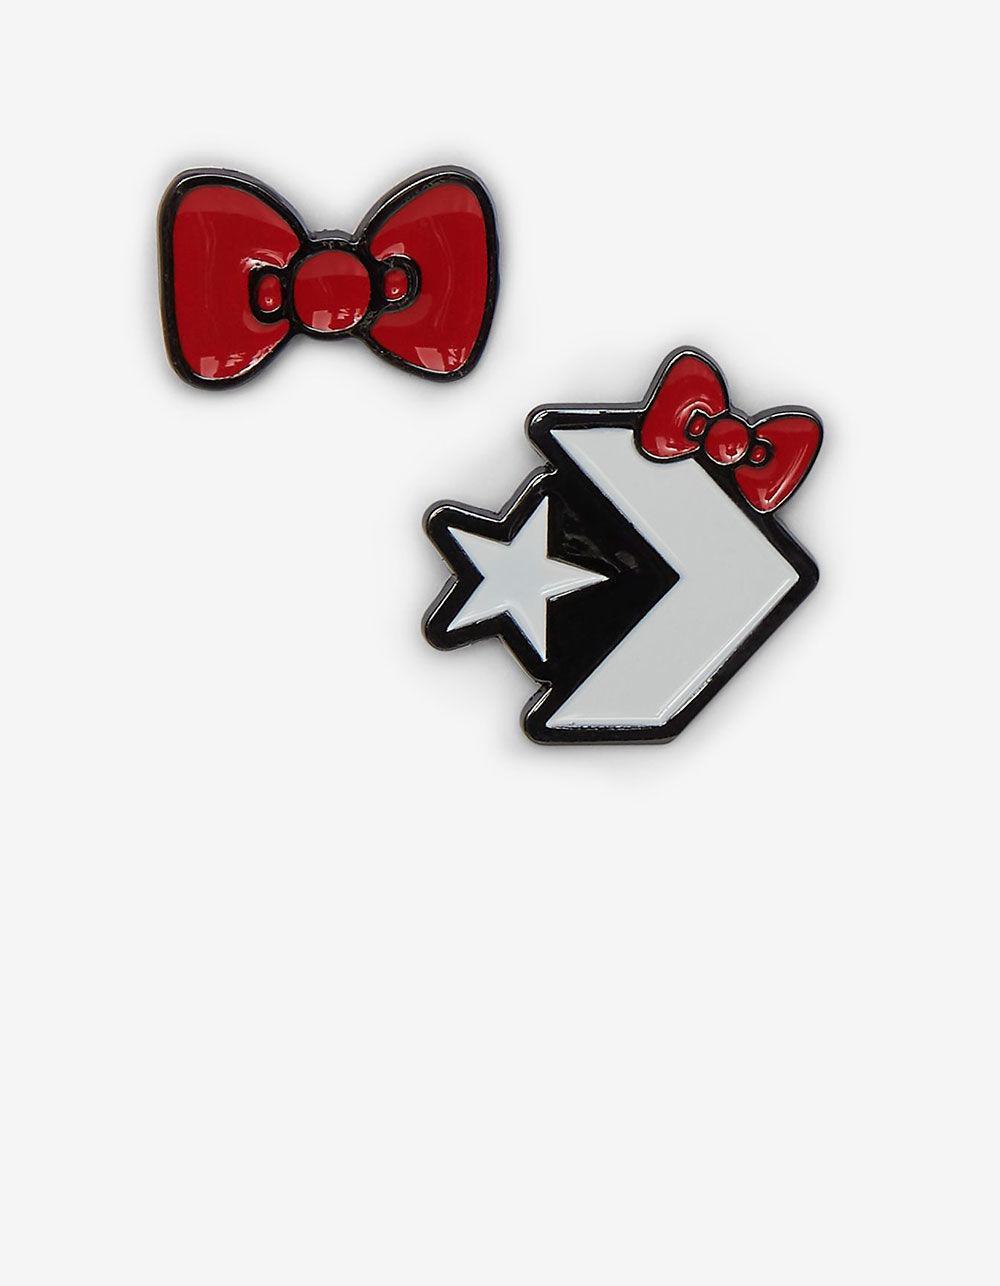 Lyst - Converse X Hello Kitty Black Mini Crossbody Bag in Black f351337bff